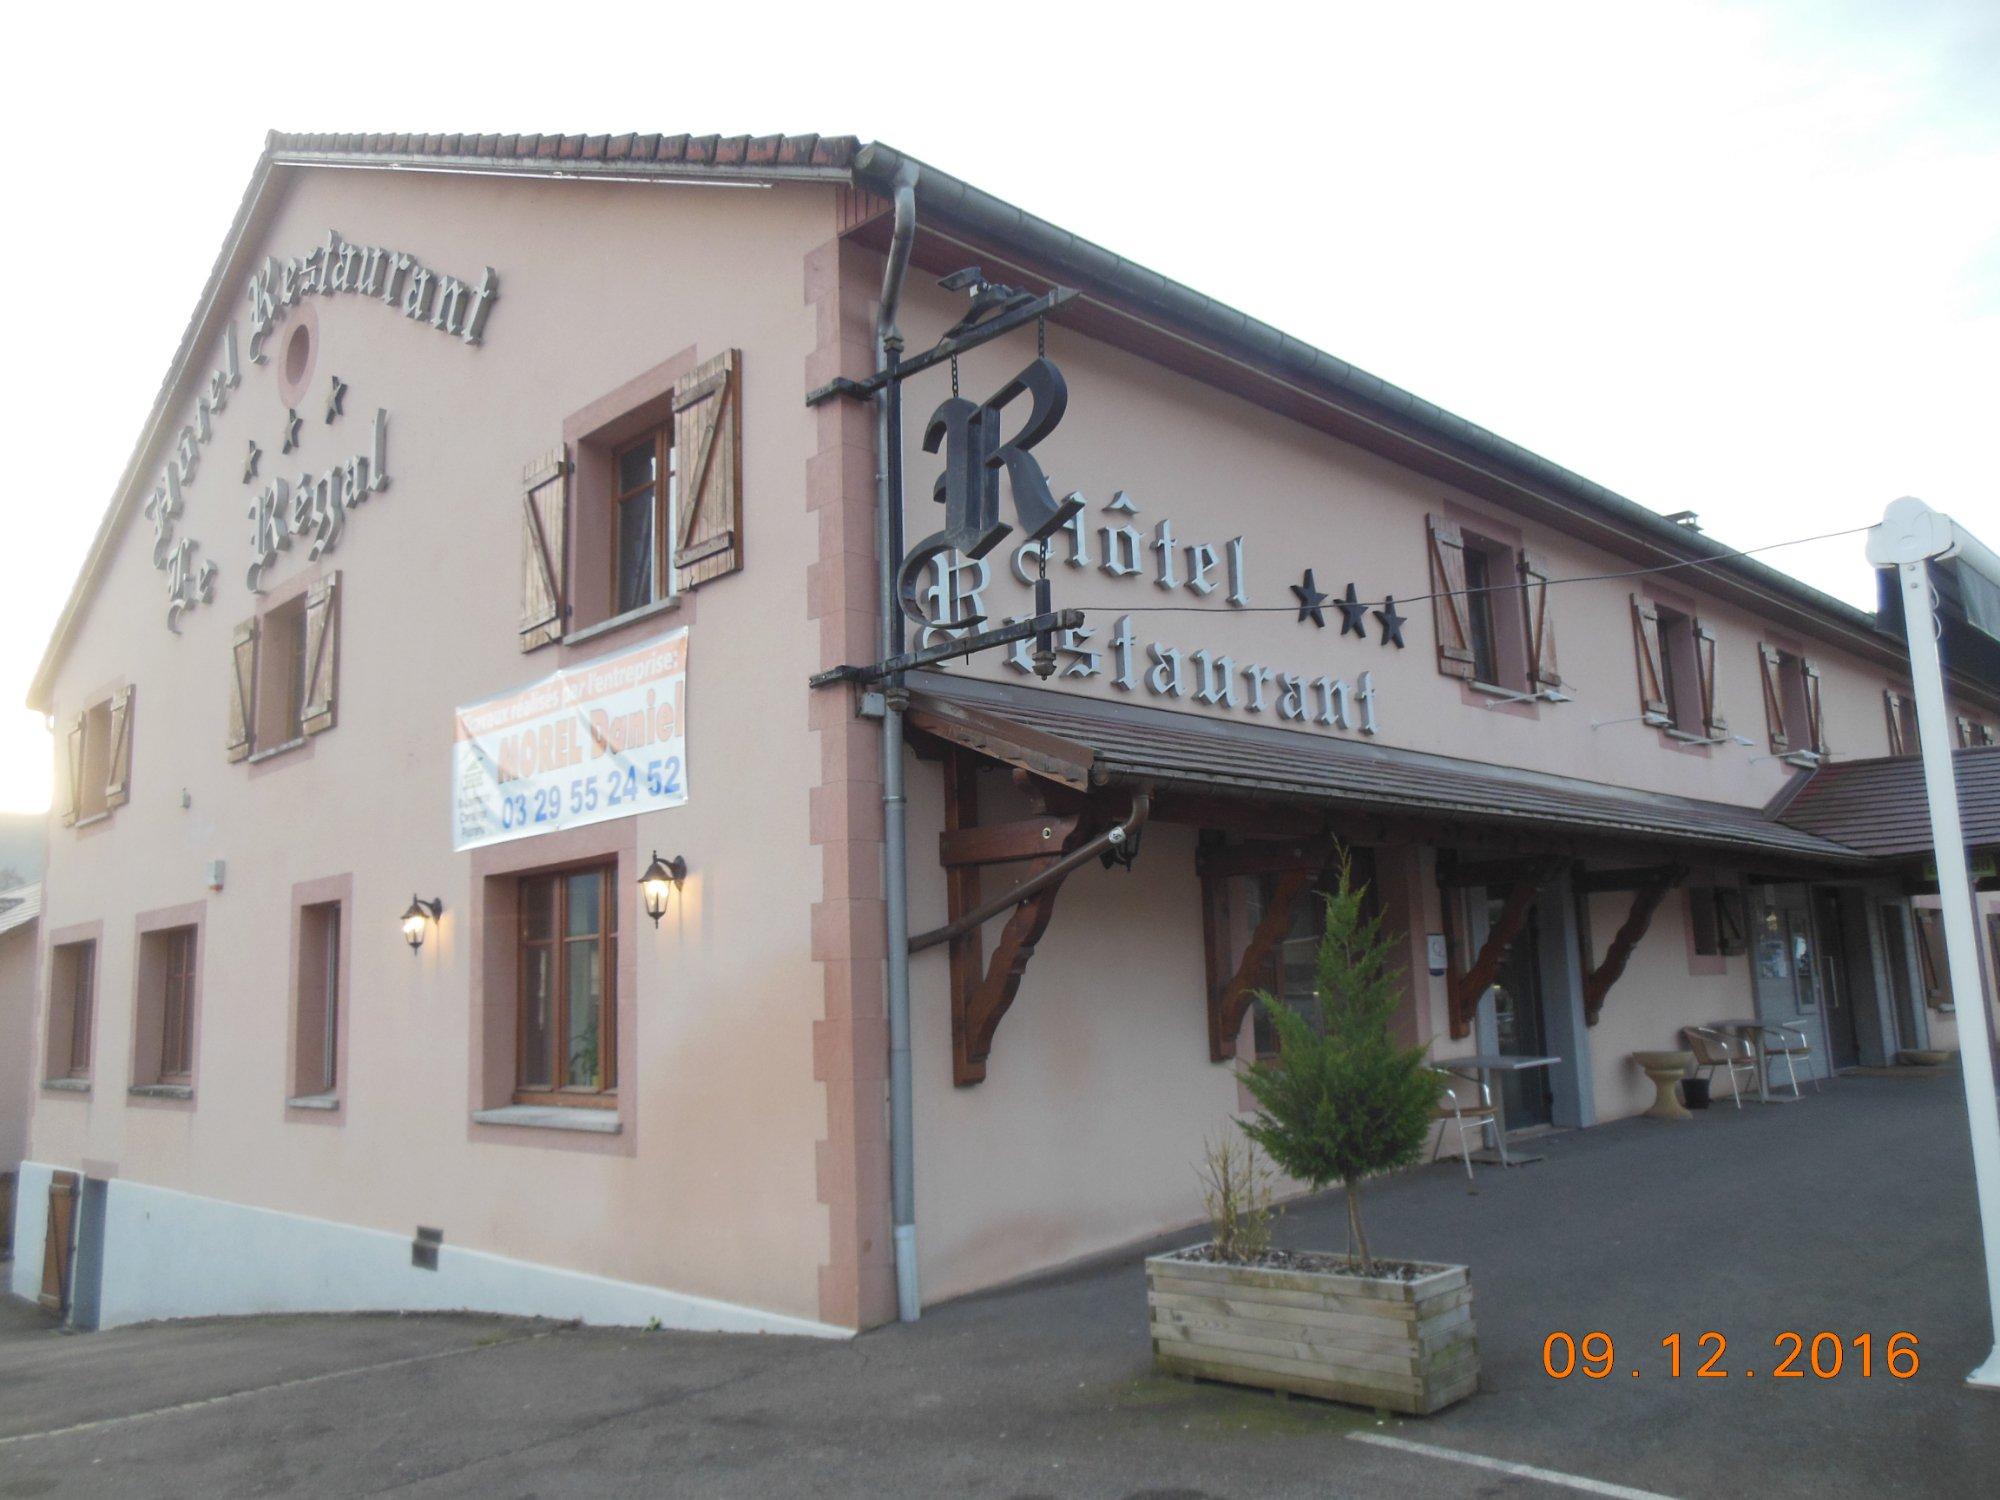 Hotel-Restaurant Le Regal